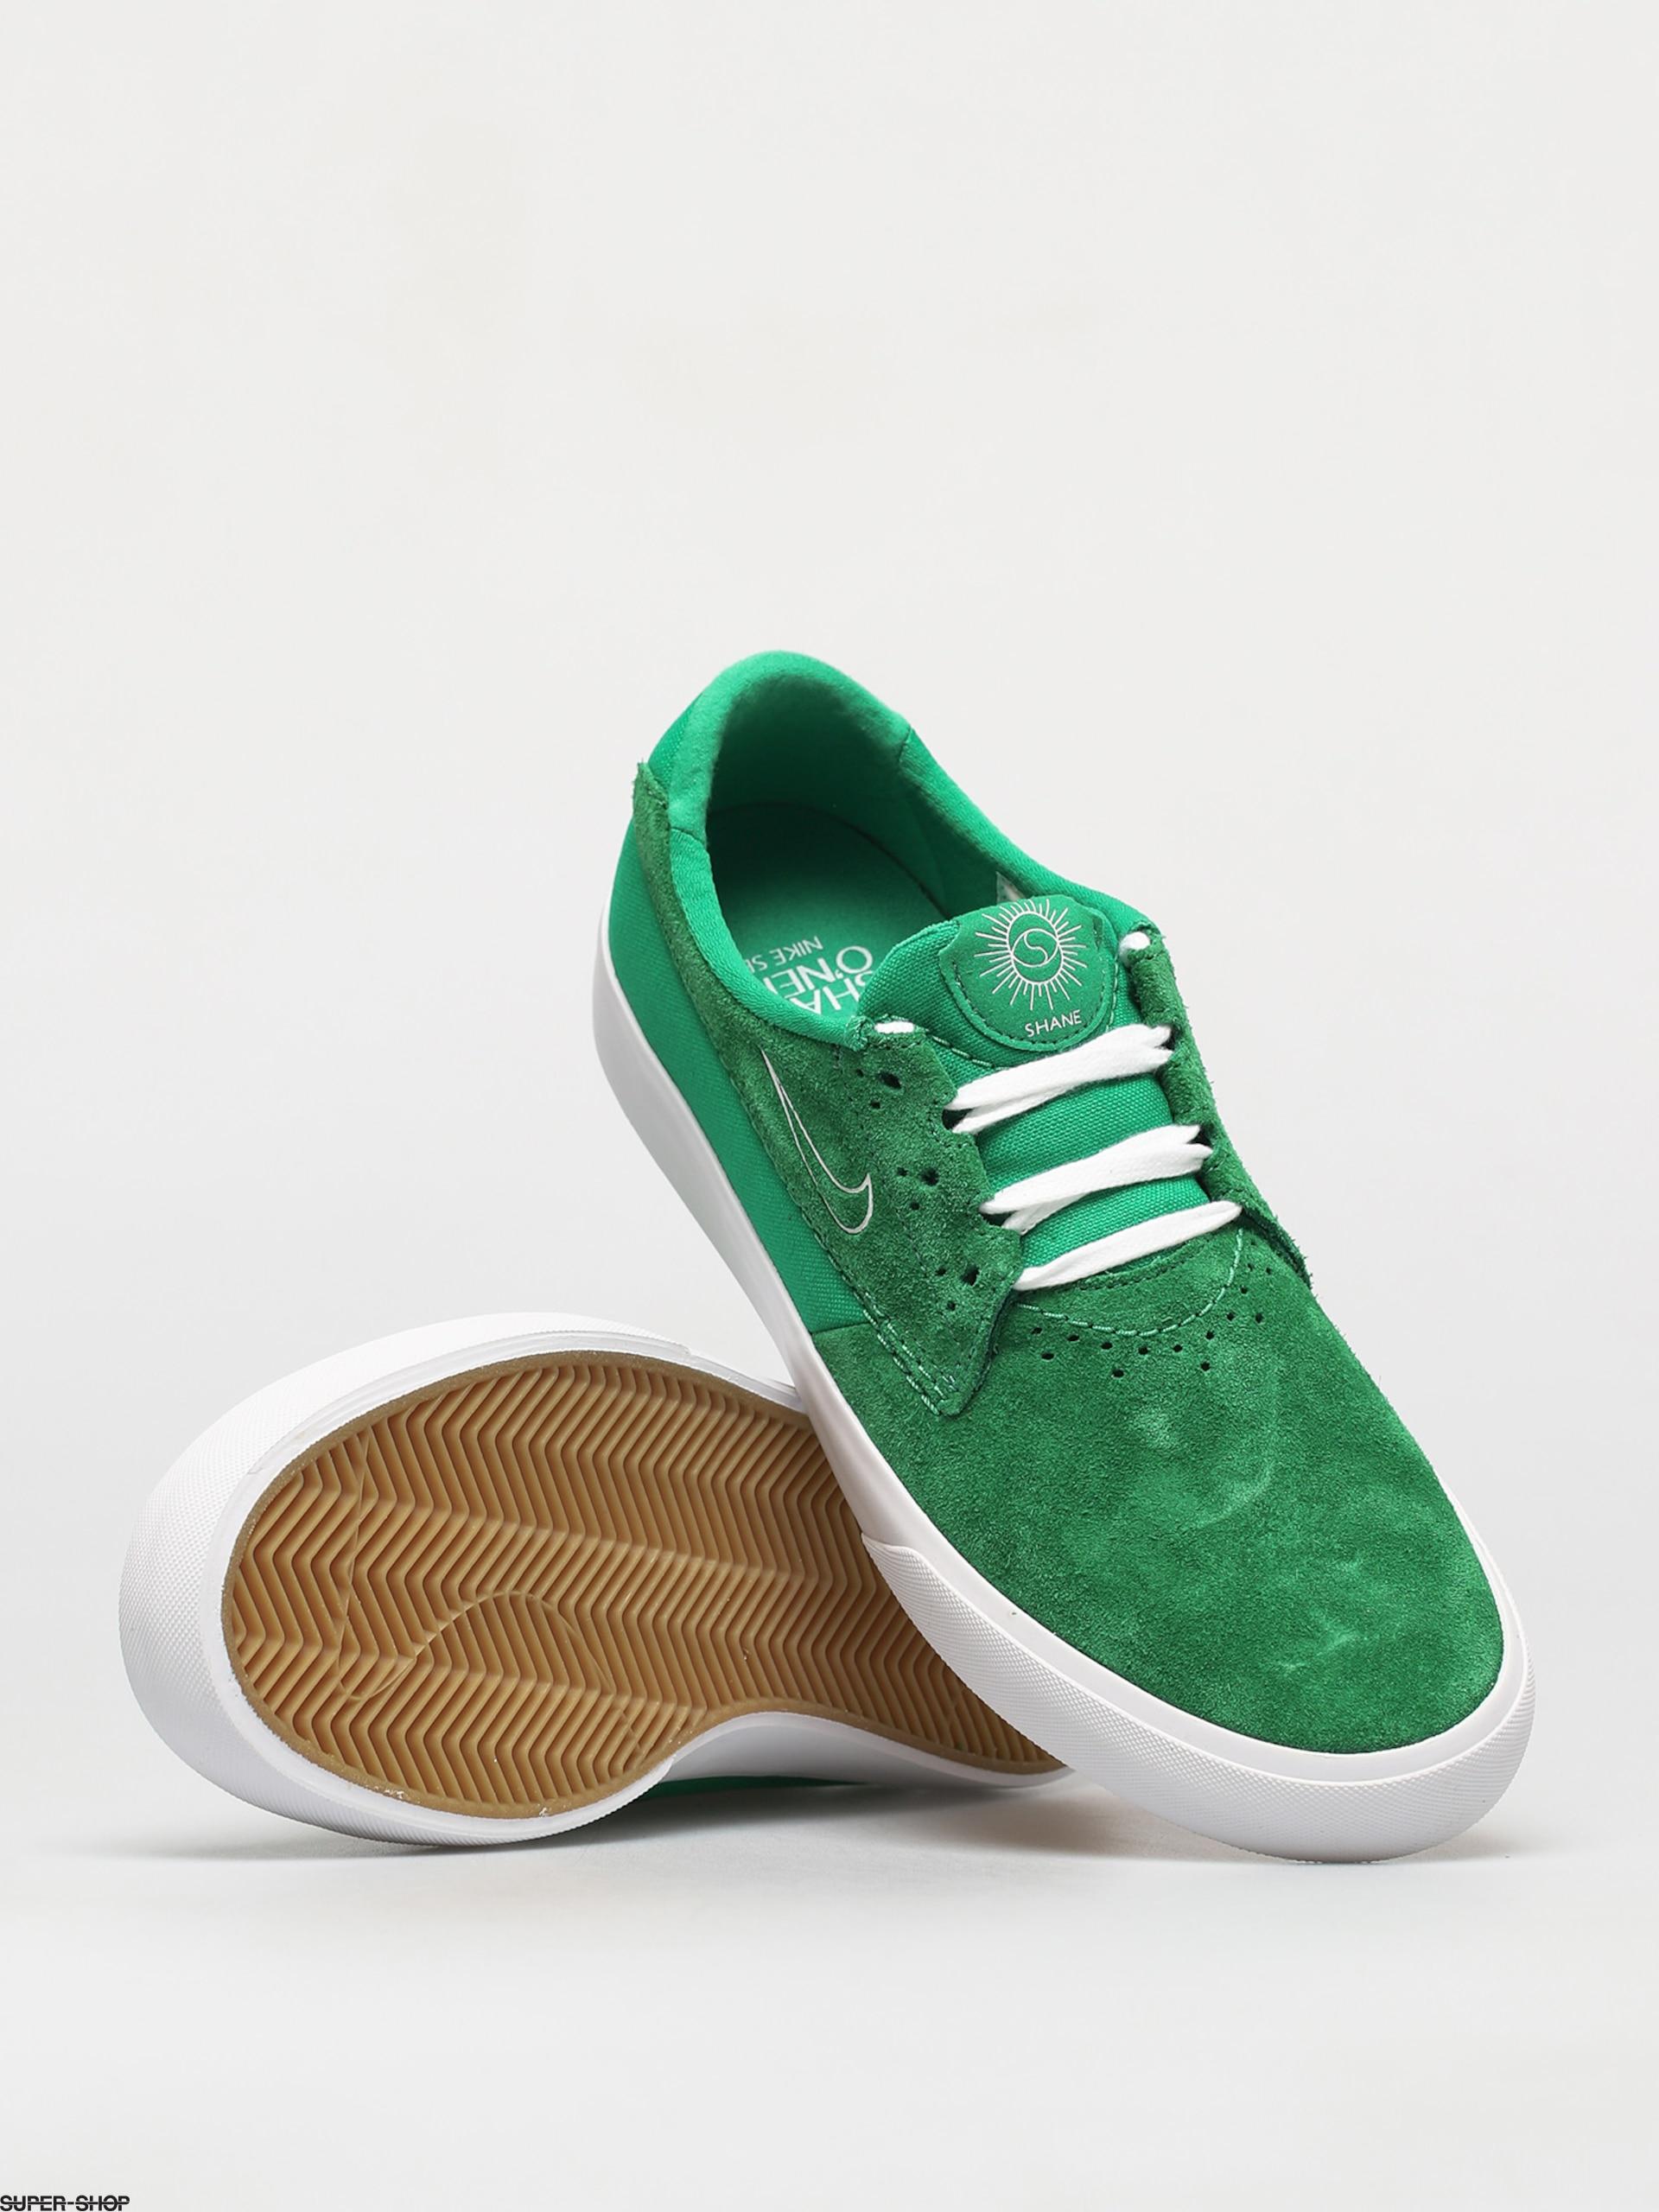 Nike SB Shane Shoes (lucky green/white lucky green white)